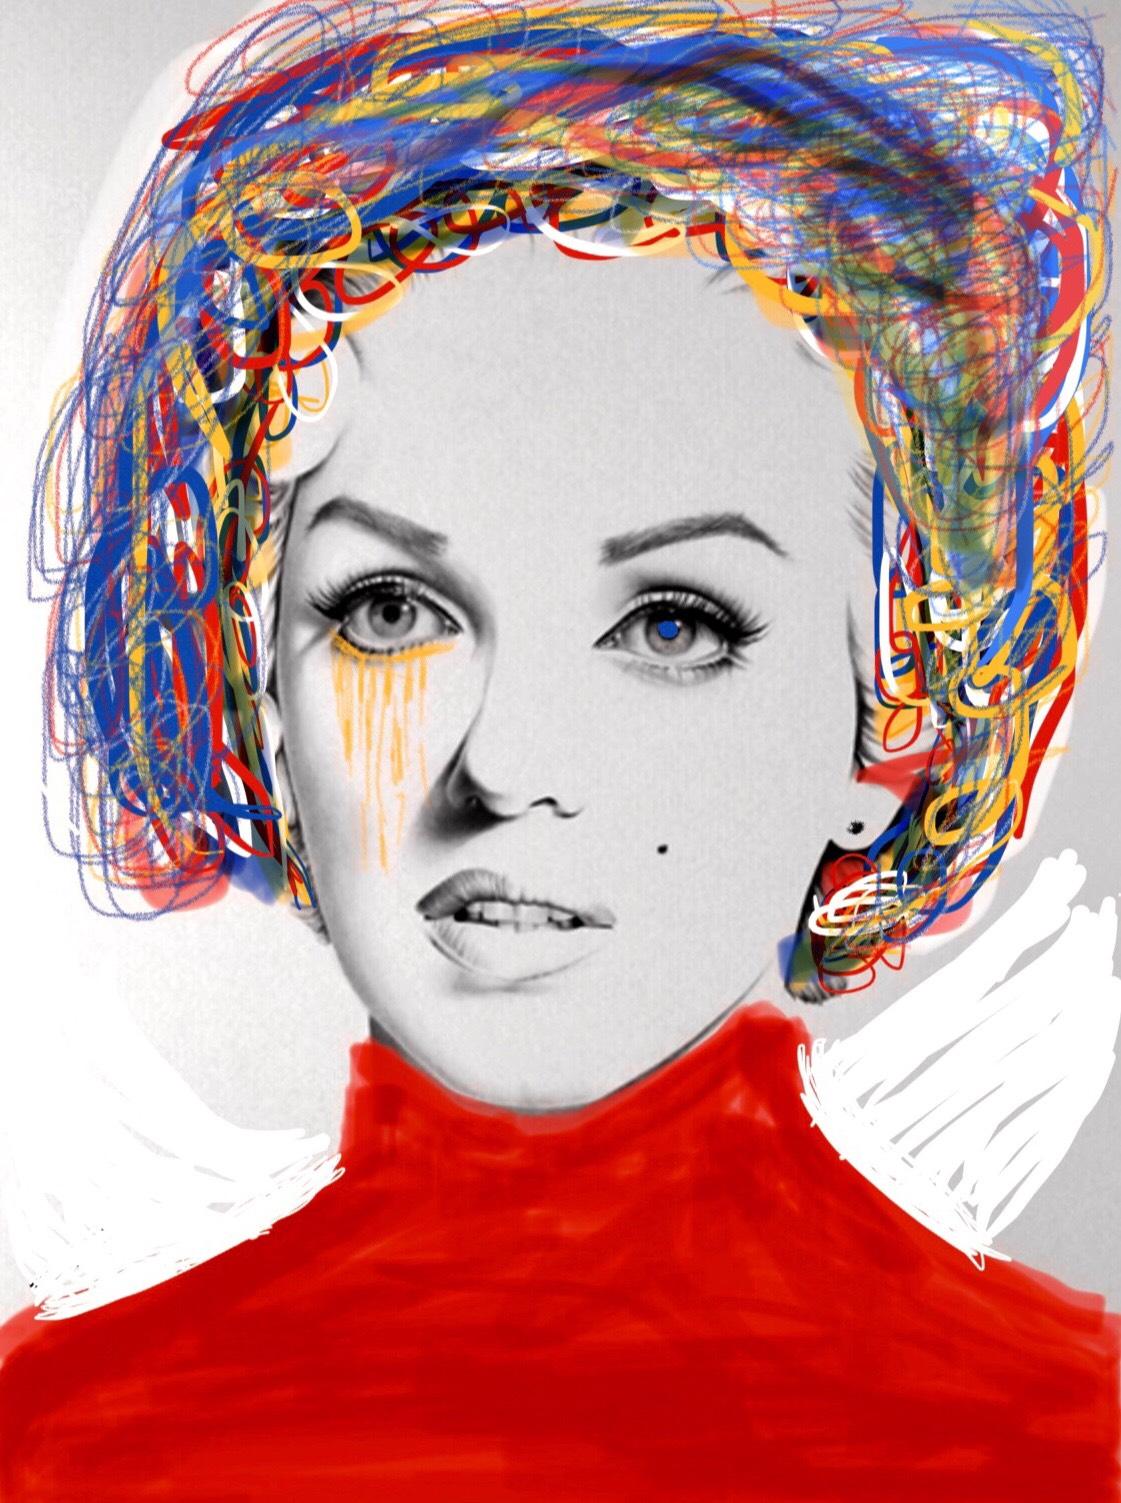 Ms. Brainwash dé Marilyn